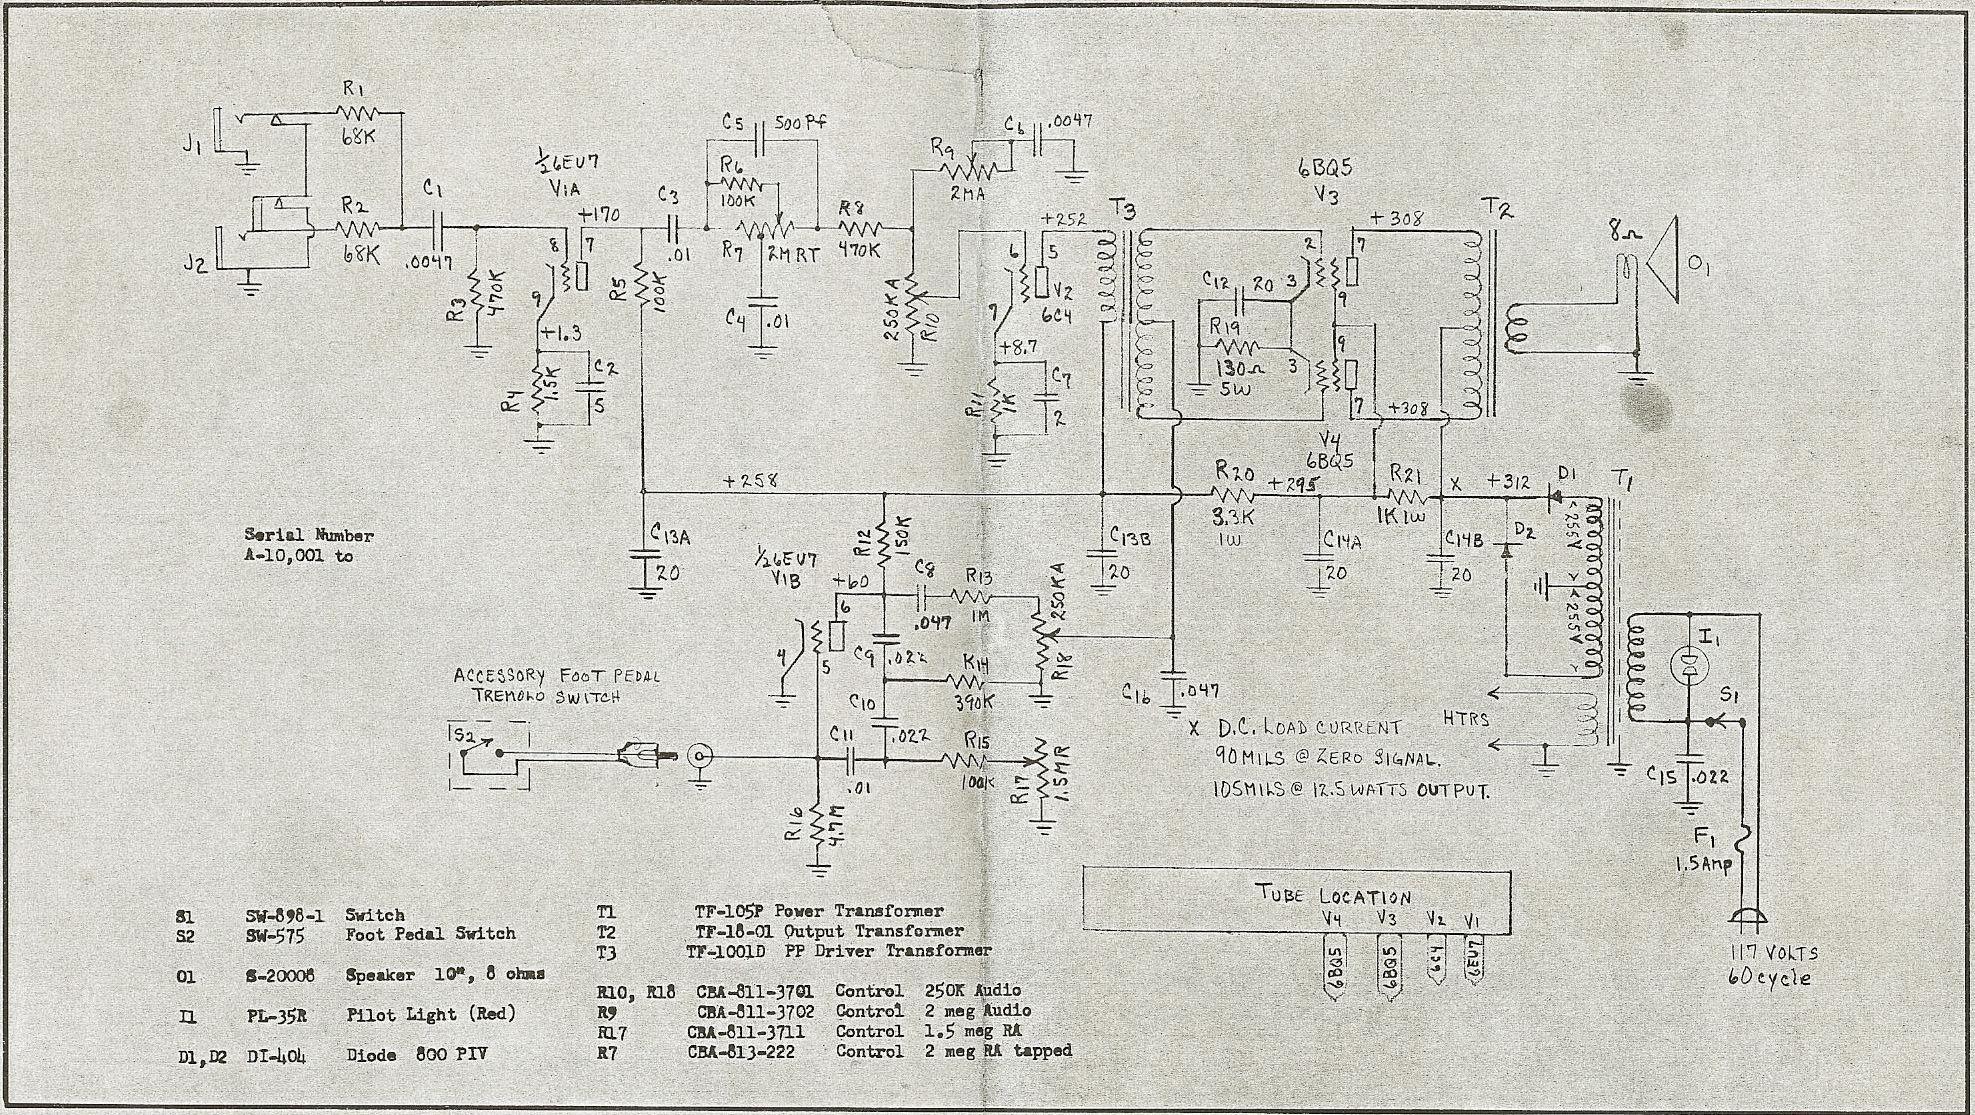 Pin By Donald Hayward On Schematics